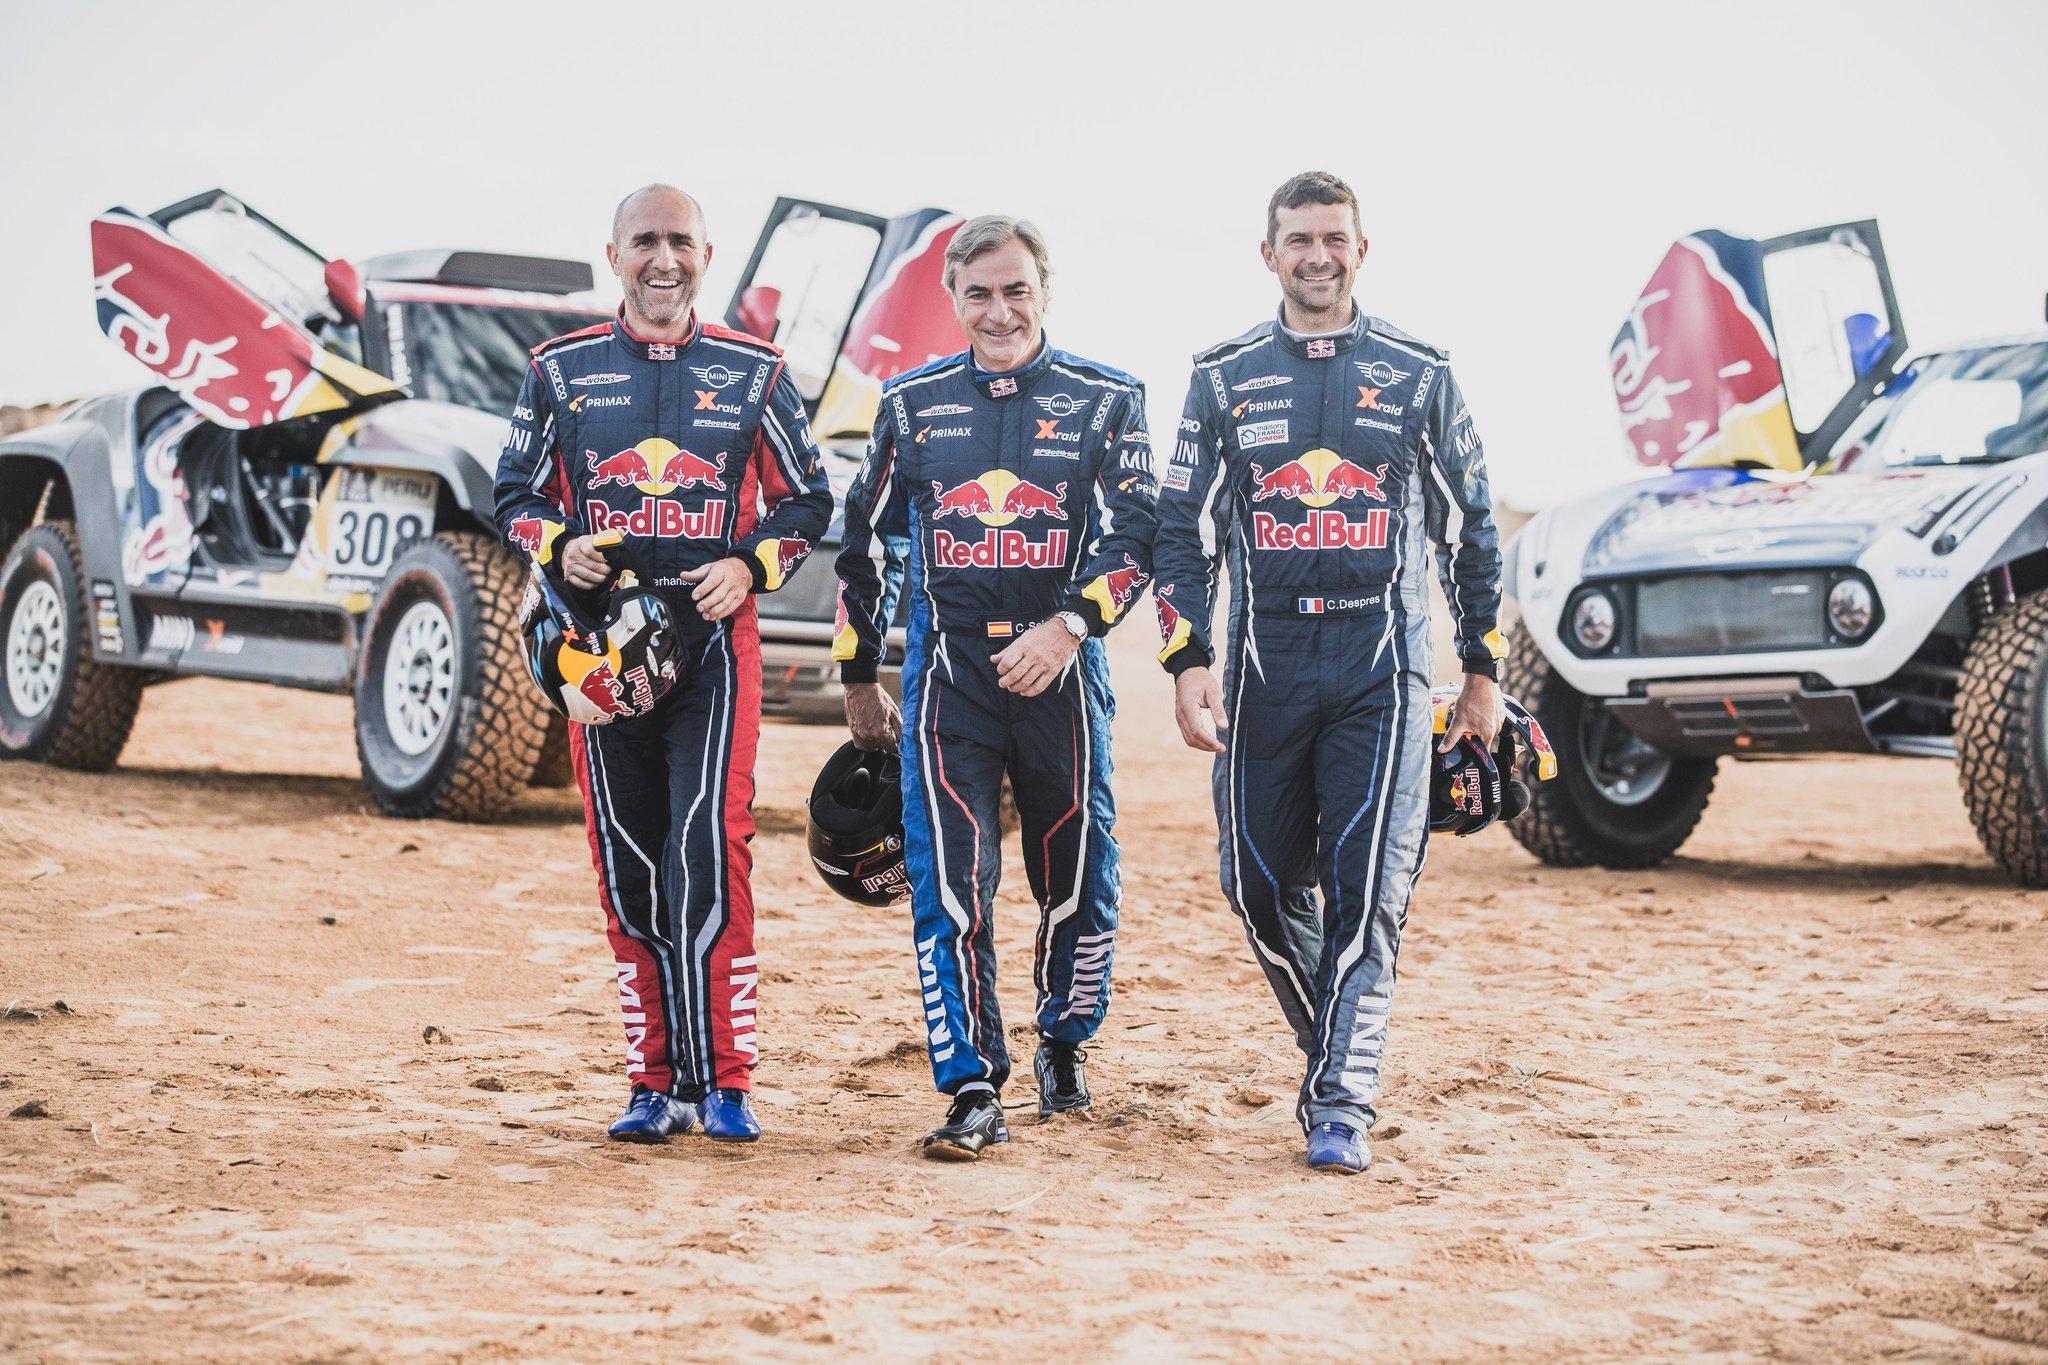 2017 Rallye Raid Dakar Paraguay - Bolivia - Argentina [2-14 Enero] - Página 37 DofNnilXkAEW_IM